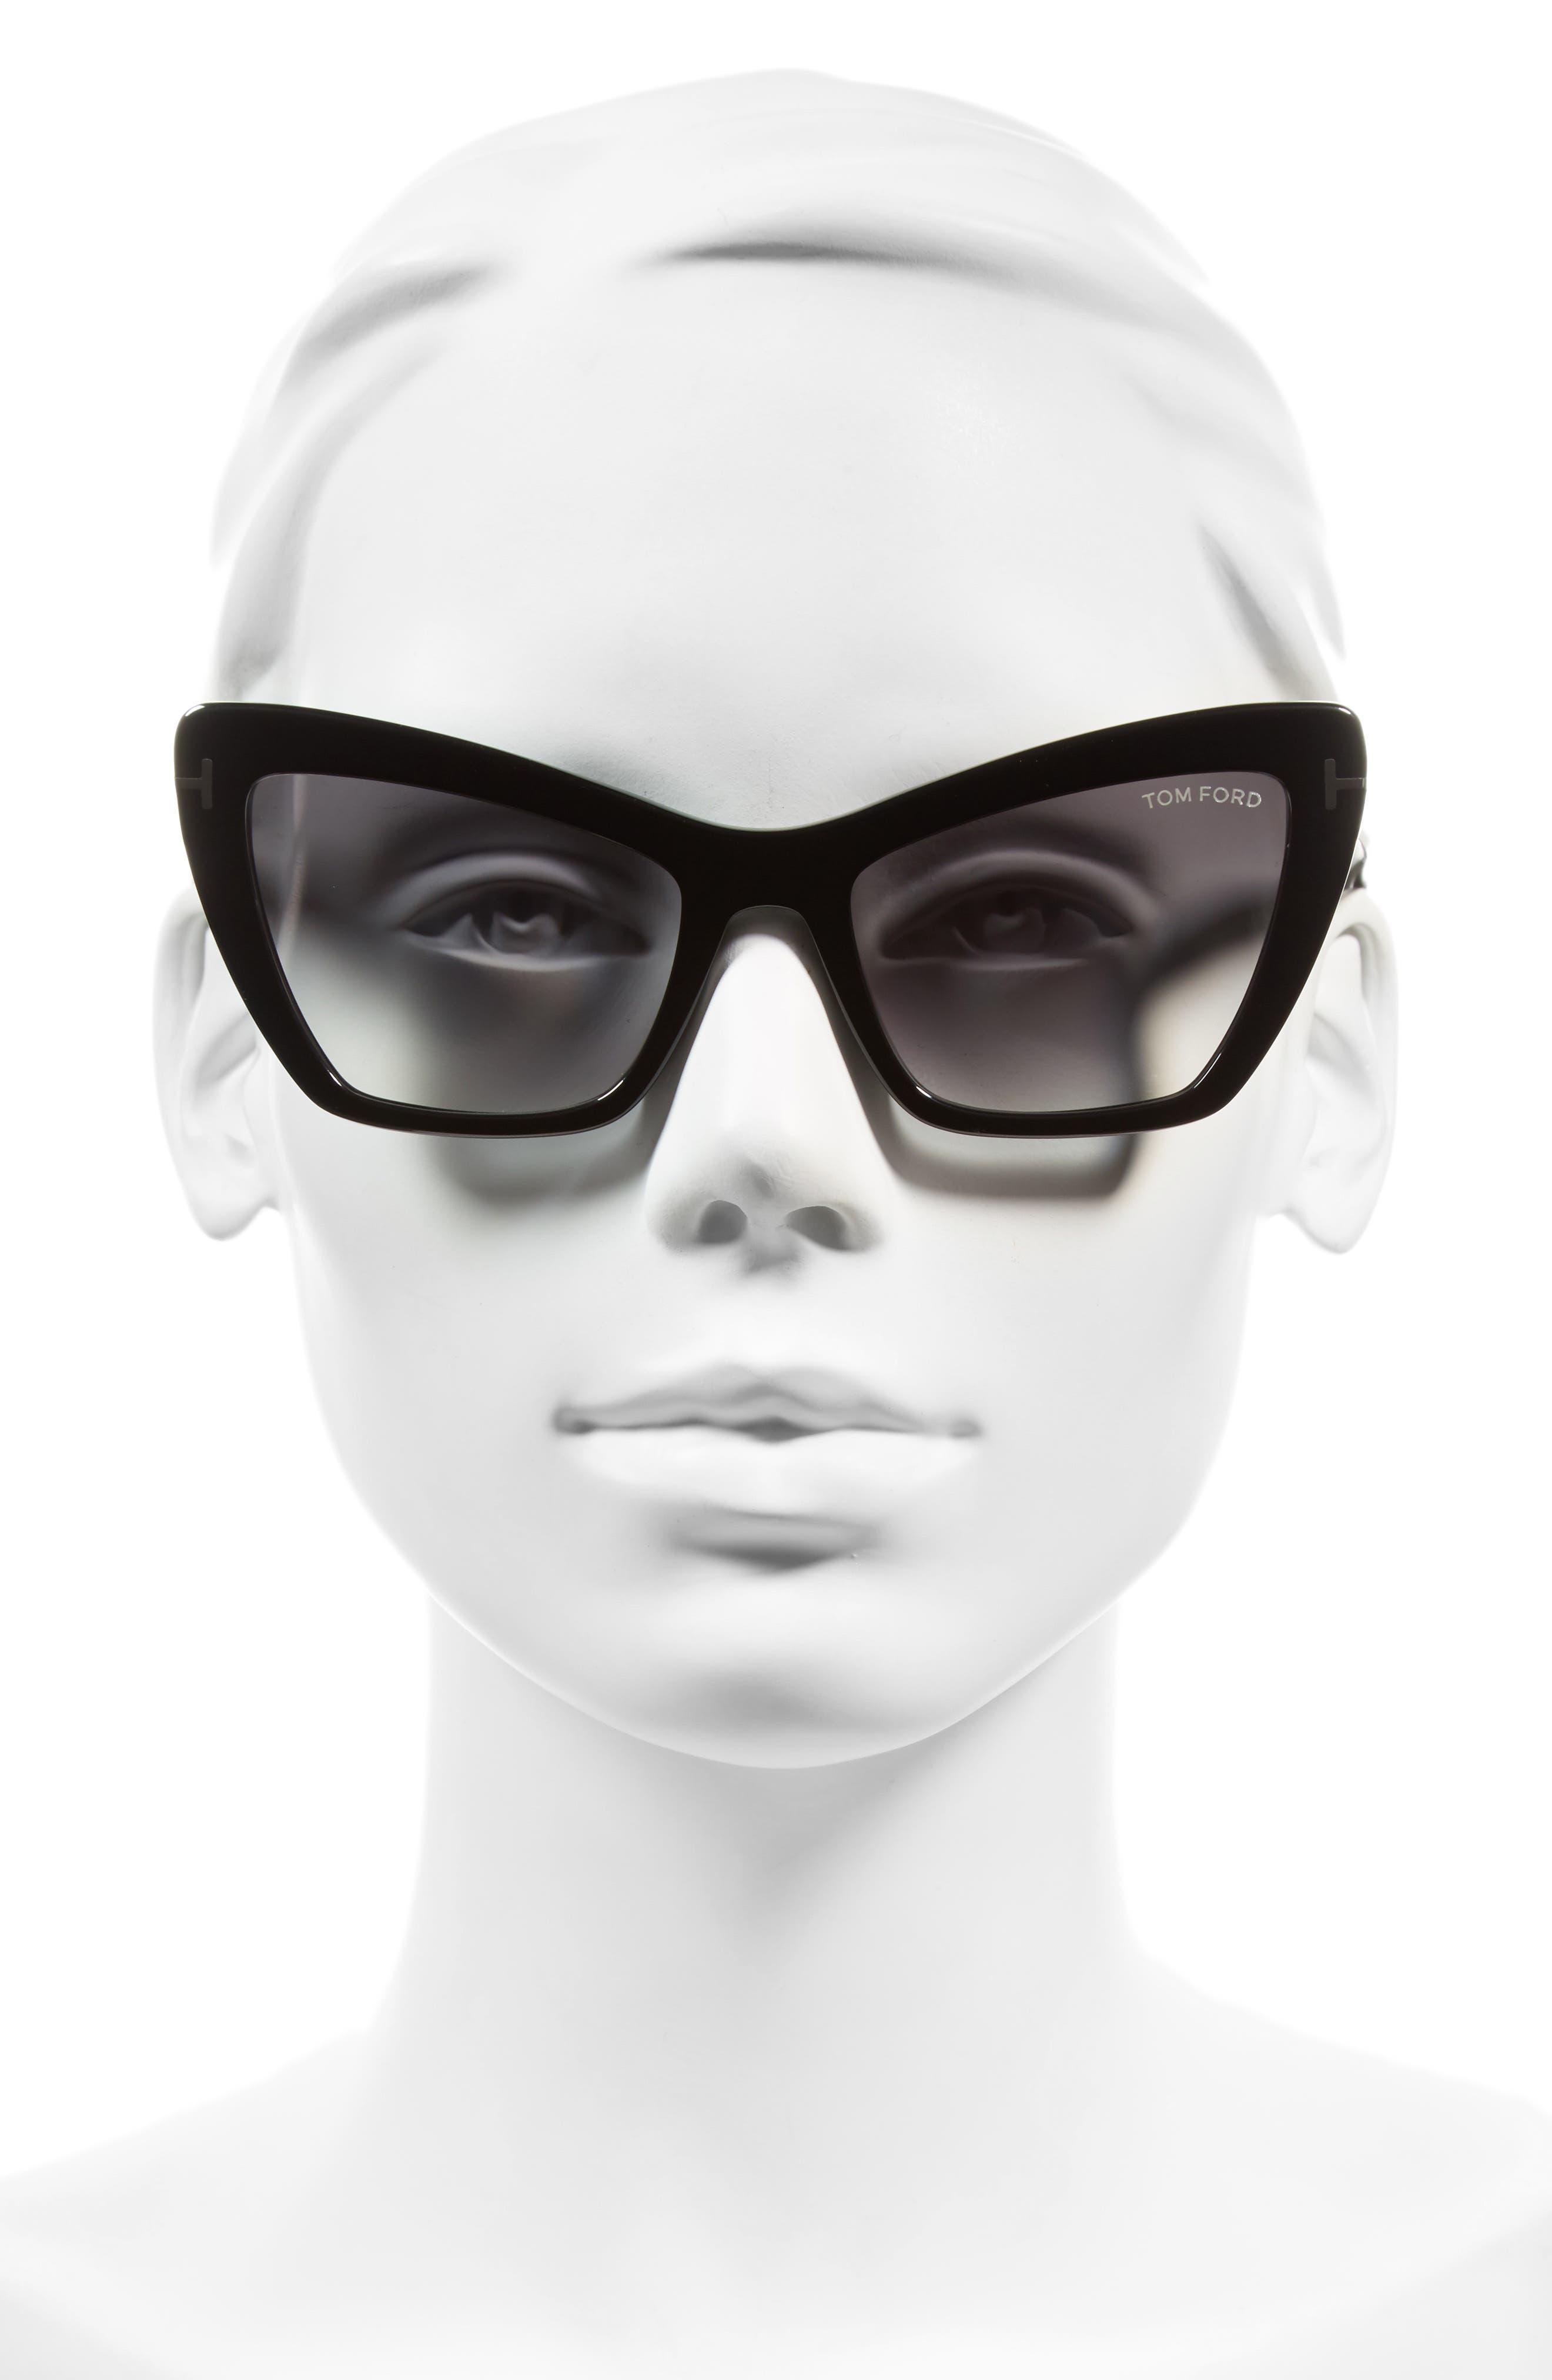 Valesca 55mm Cat Eye Sunglasses,                             Alternate thumbnail 2, color,                             Shiny Black/ Gradient Smoke